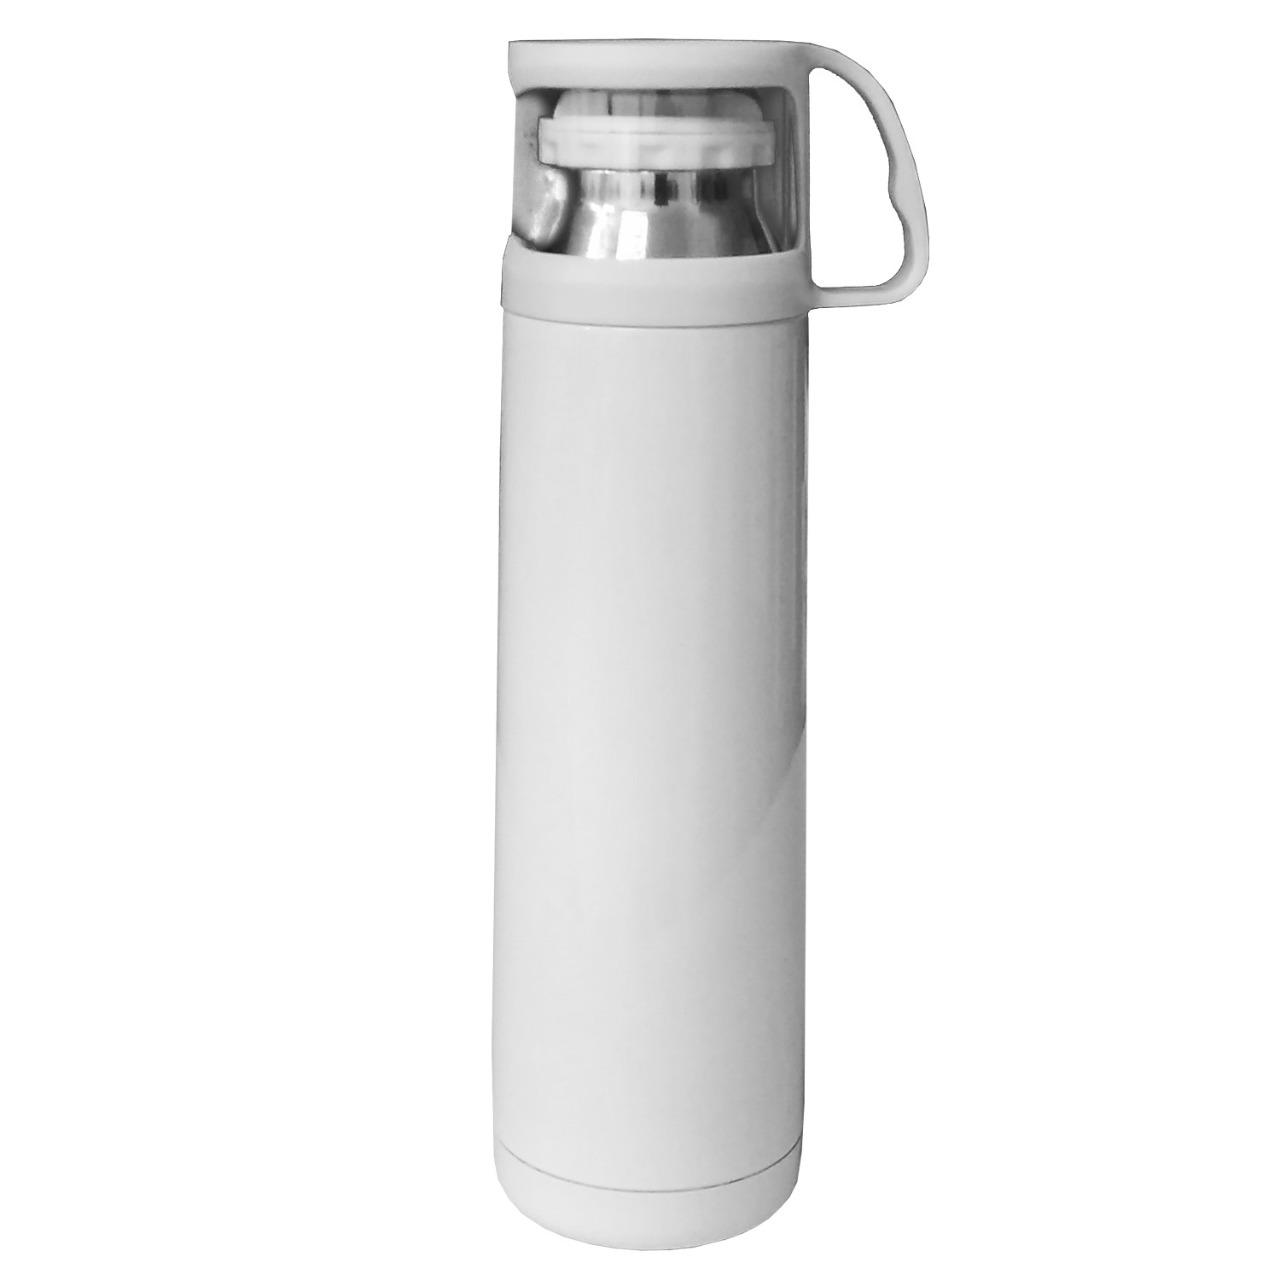 Garrafa Térmica Cônica Branca- 500ml